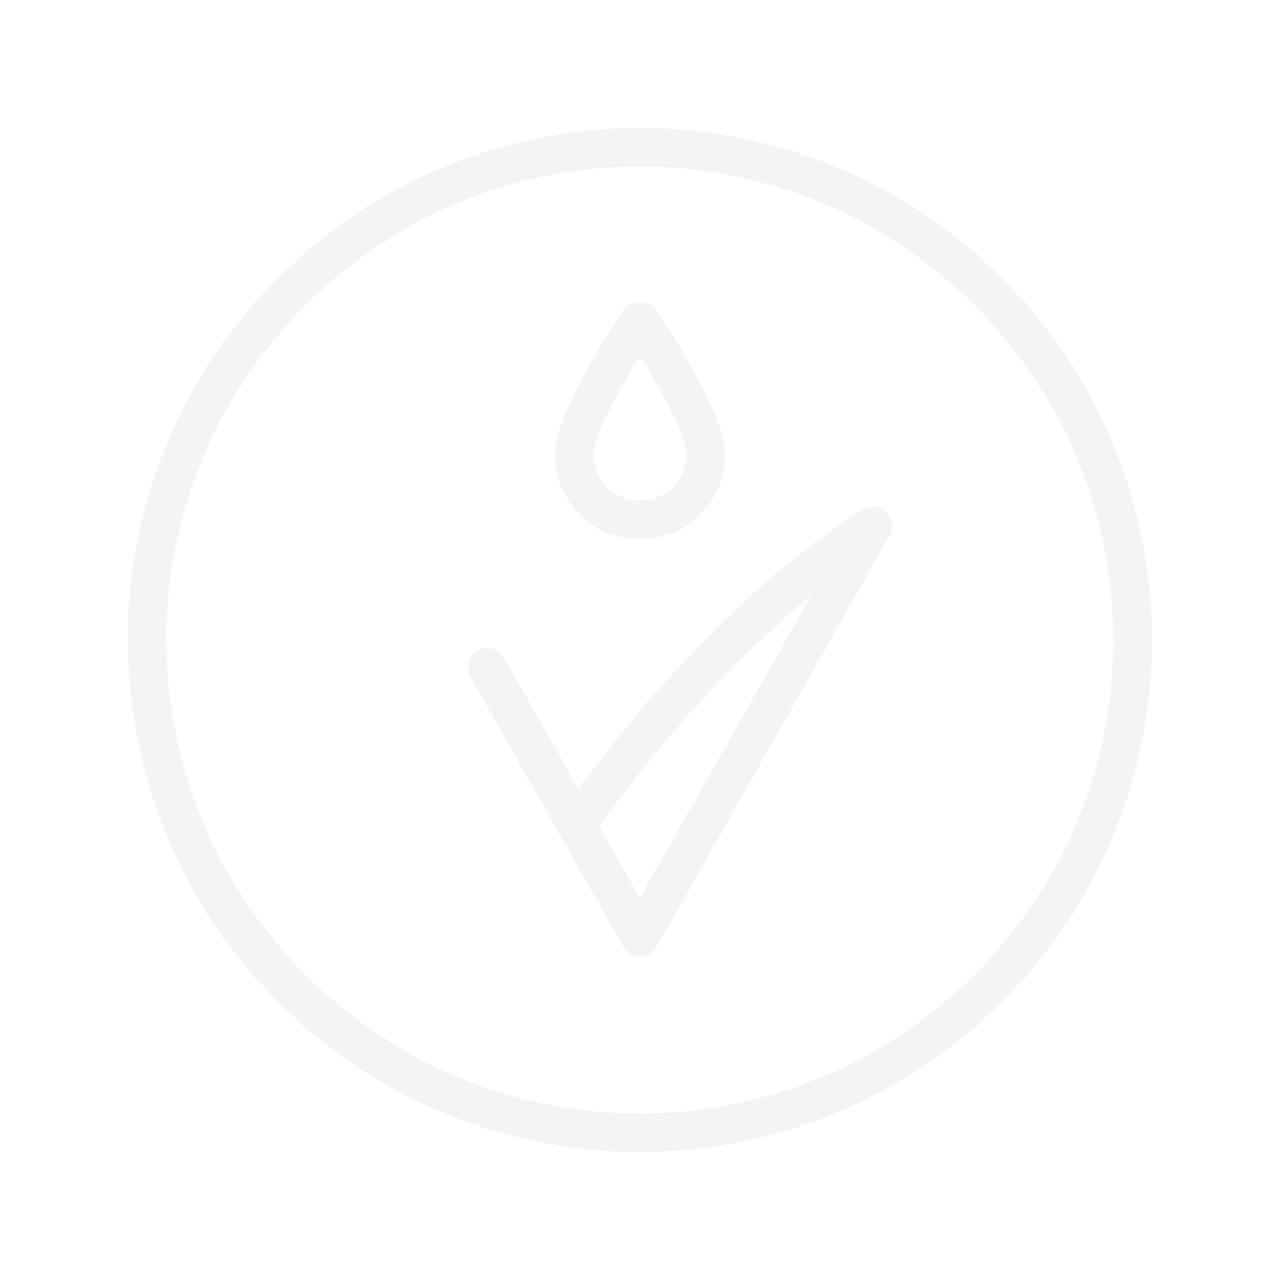 BIOKAP Nutricolor 4.5 Mahogany Brown Permanent Hair Dye 140ml